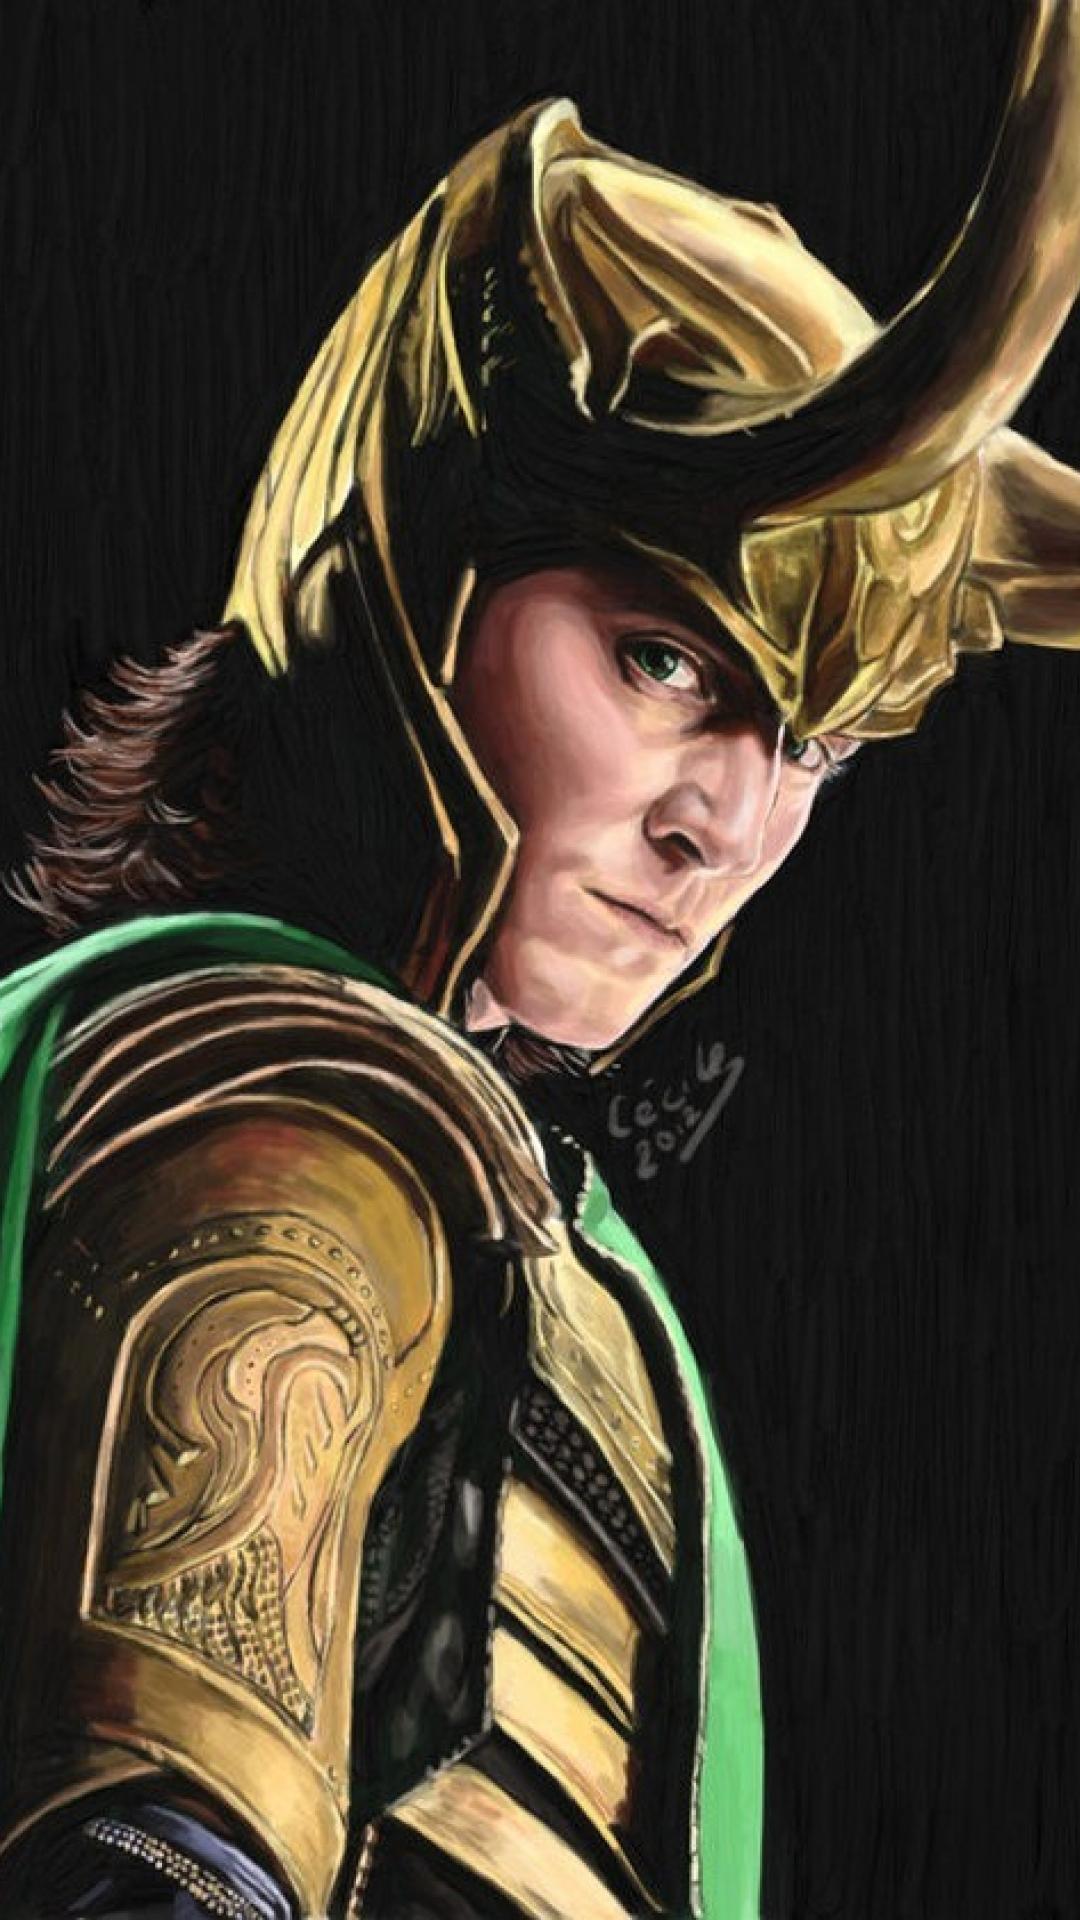 Loki Phone Wallpapers - Top Free Loki Phone Backgrounds ...